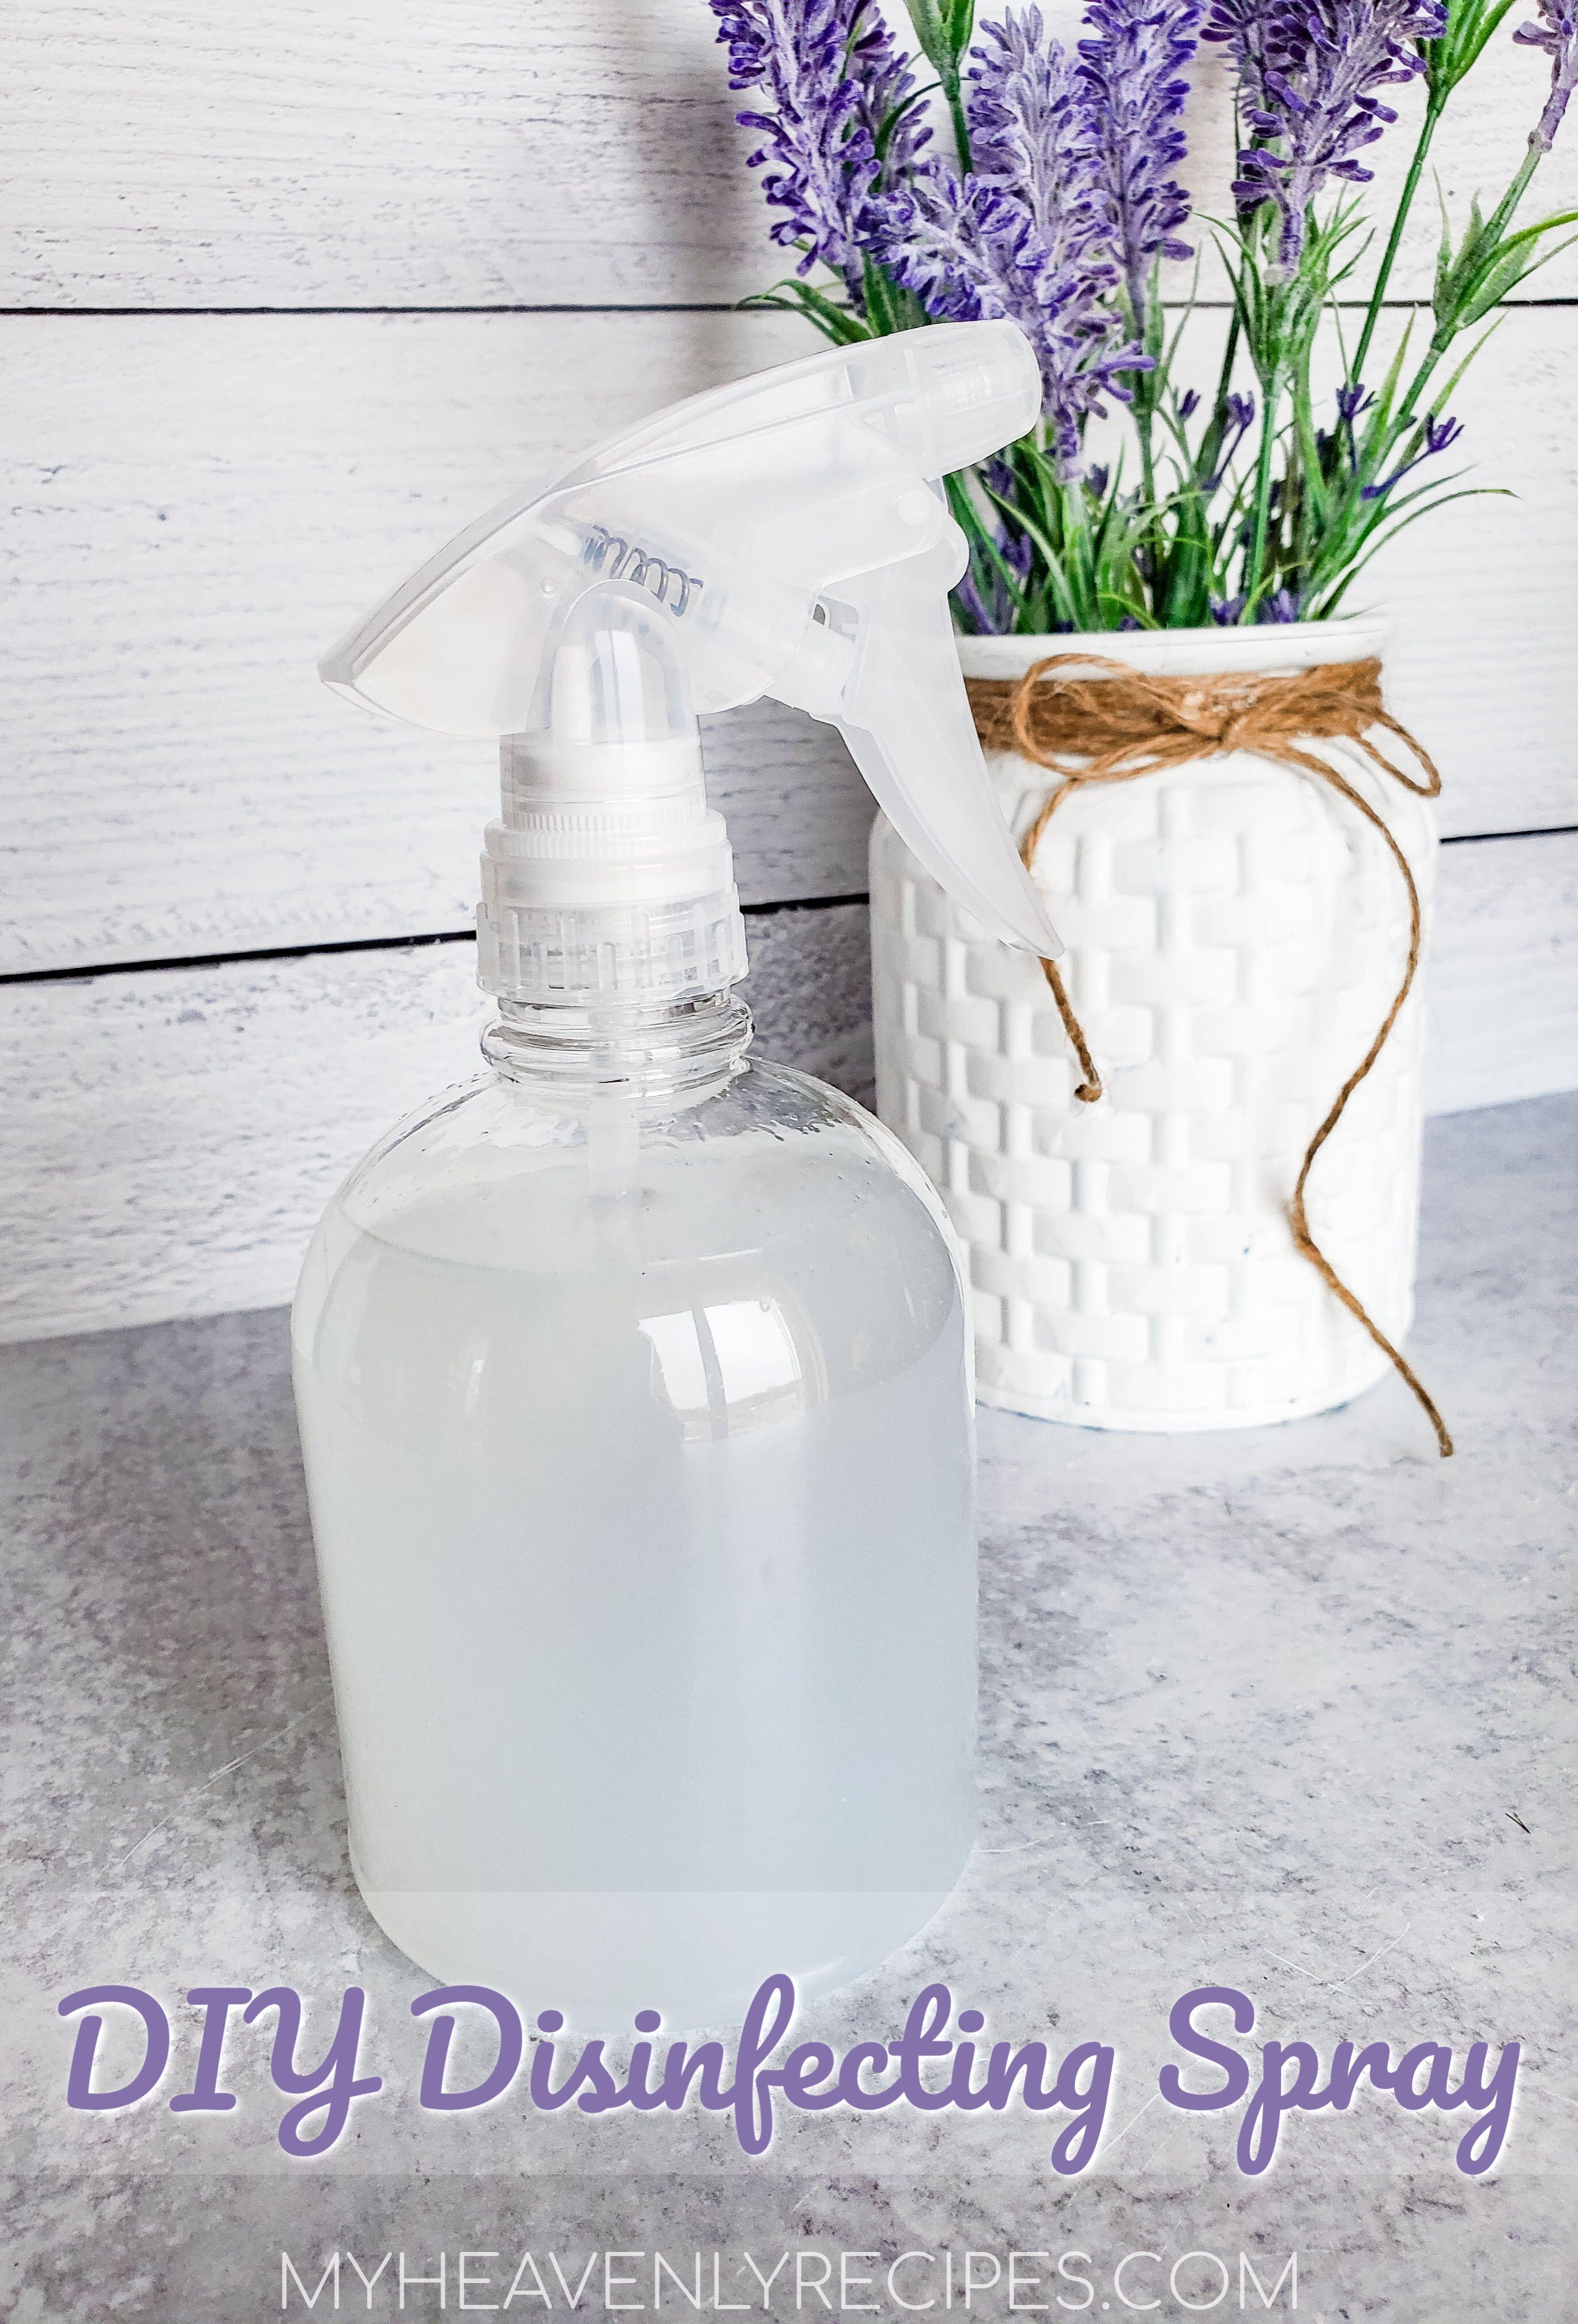 Diy disinfecting spray to make at home homemade